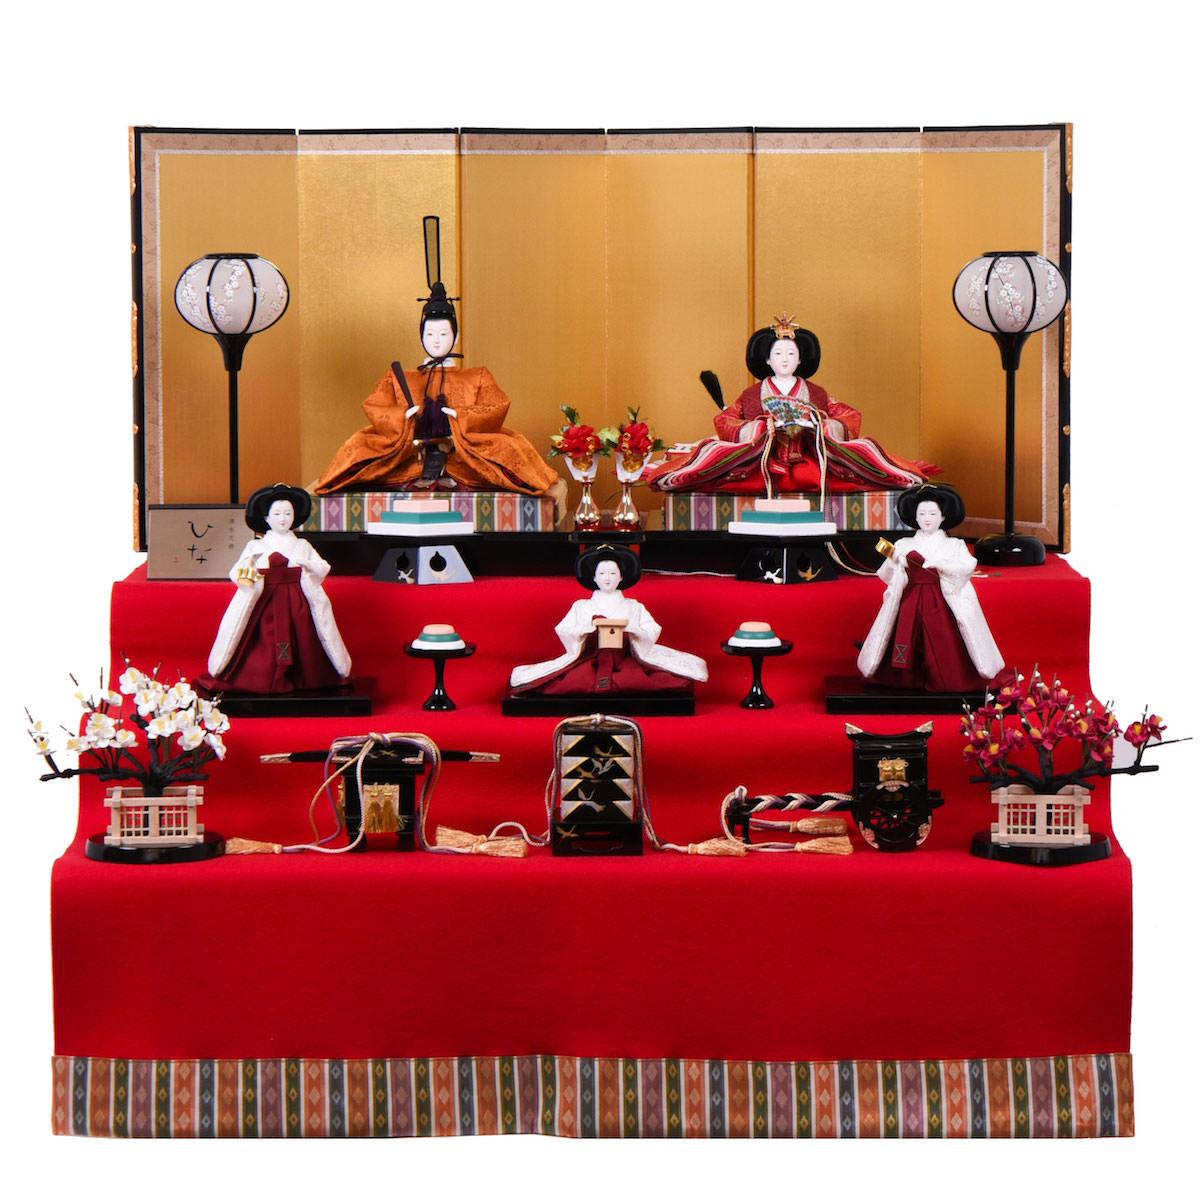 雛人形 三五 収納台5人飾 清水久遊(ひいな) 正絹桐竹鳳凰文 三白官女 送料無料